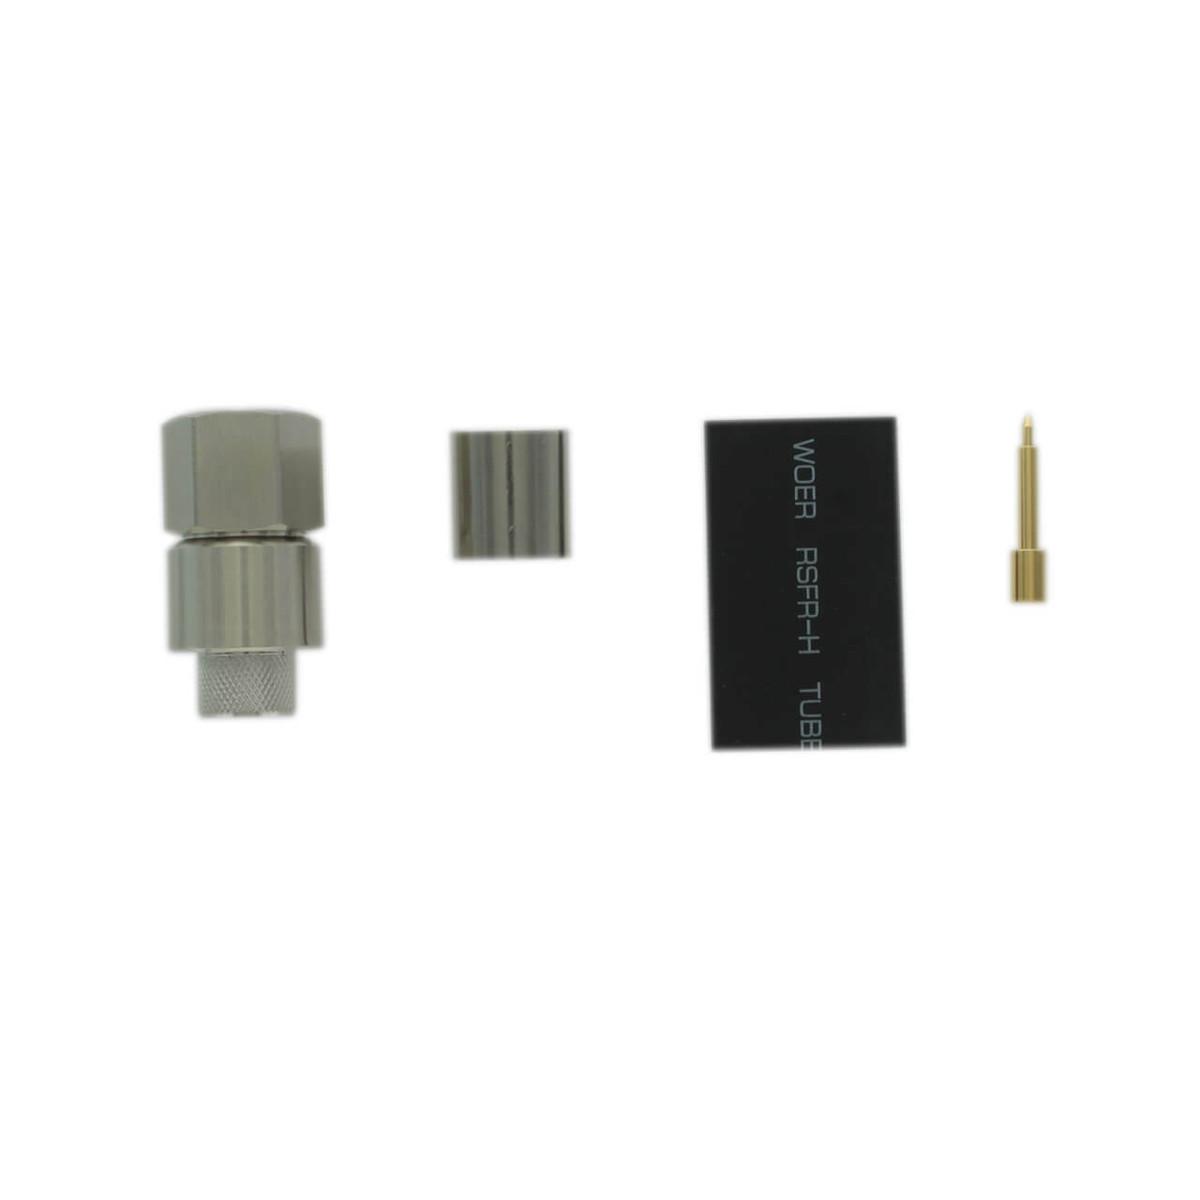 Bolton Technical N-Male Bolton600 Crimp Connector